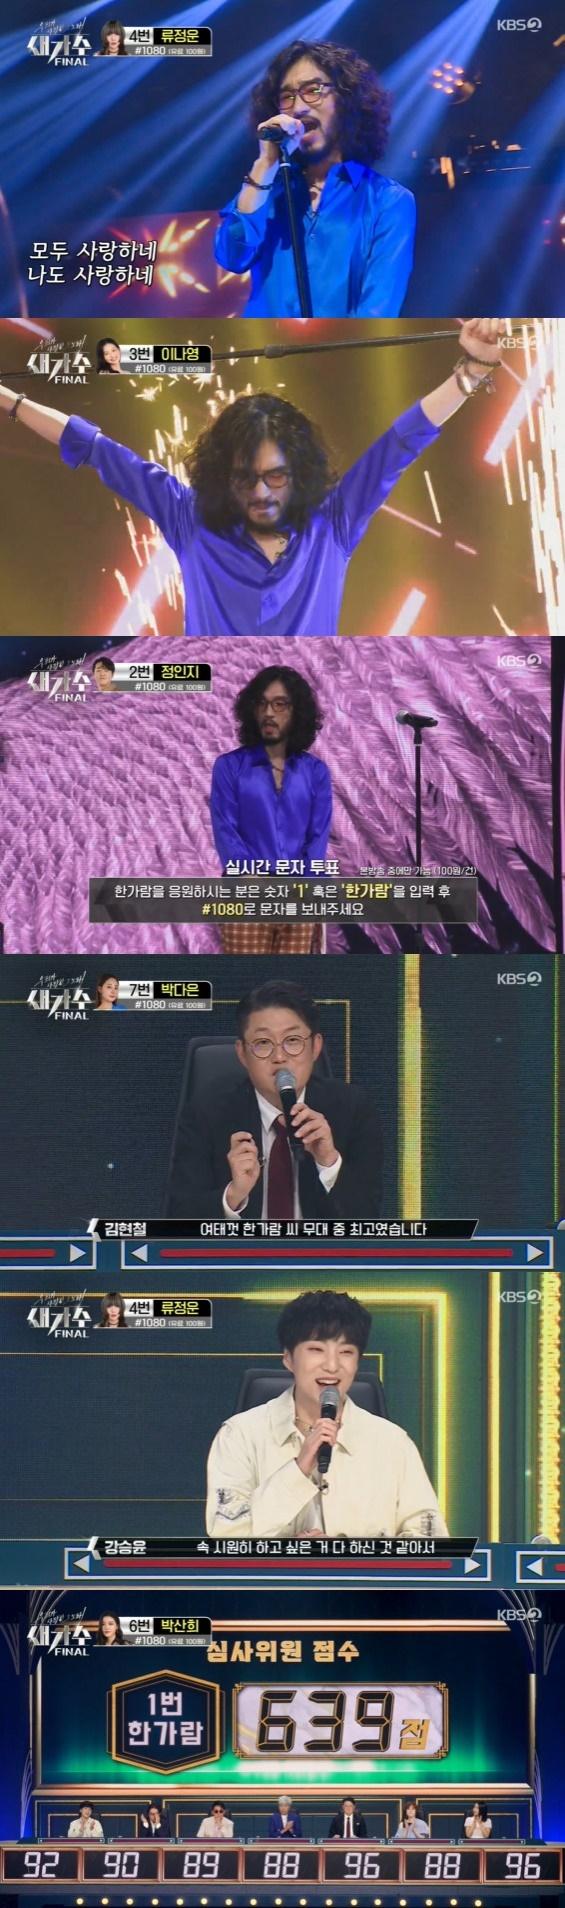 KBS 2TV '우리가 사랑한 그 노래 새가수' 방송 화면 캡처 © 뉴스1